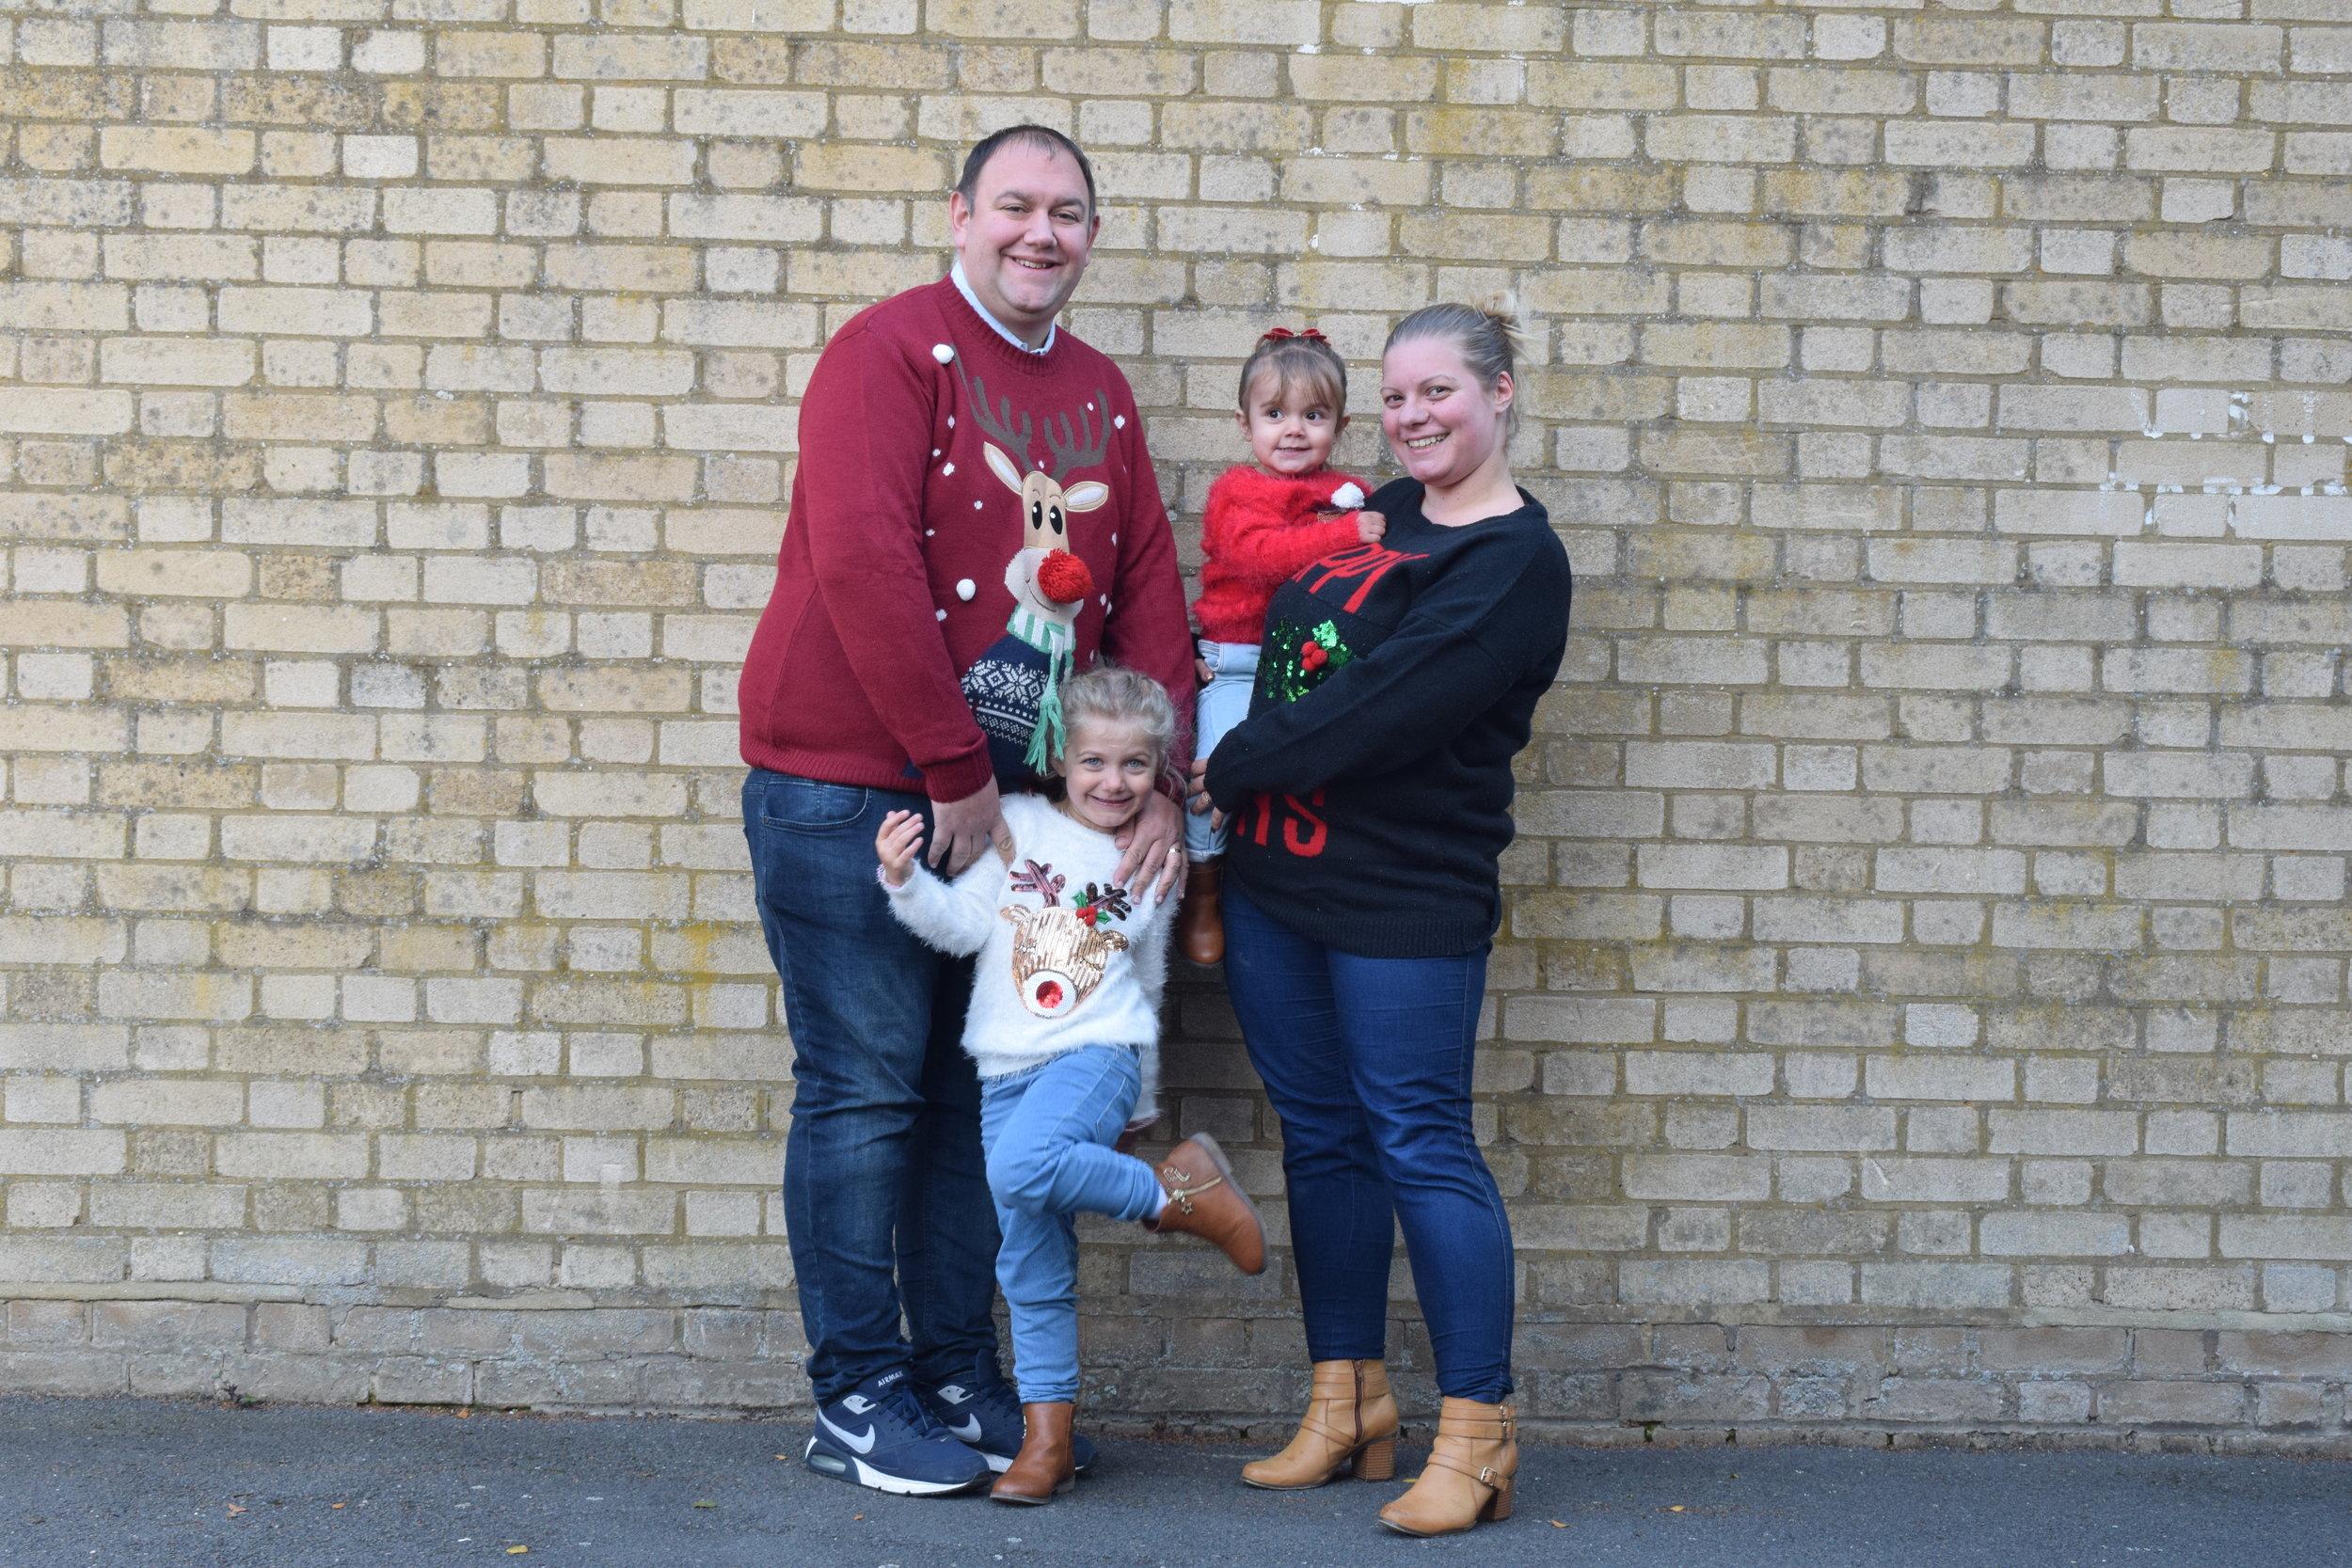 Me Becoming Mum family Christmas photo